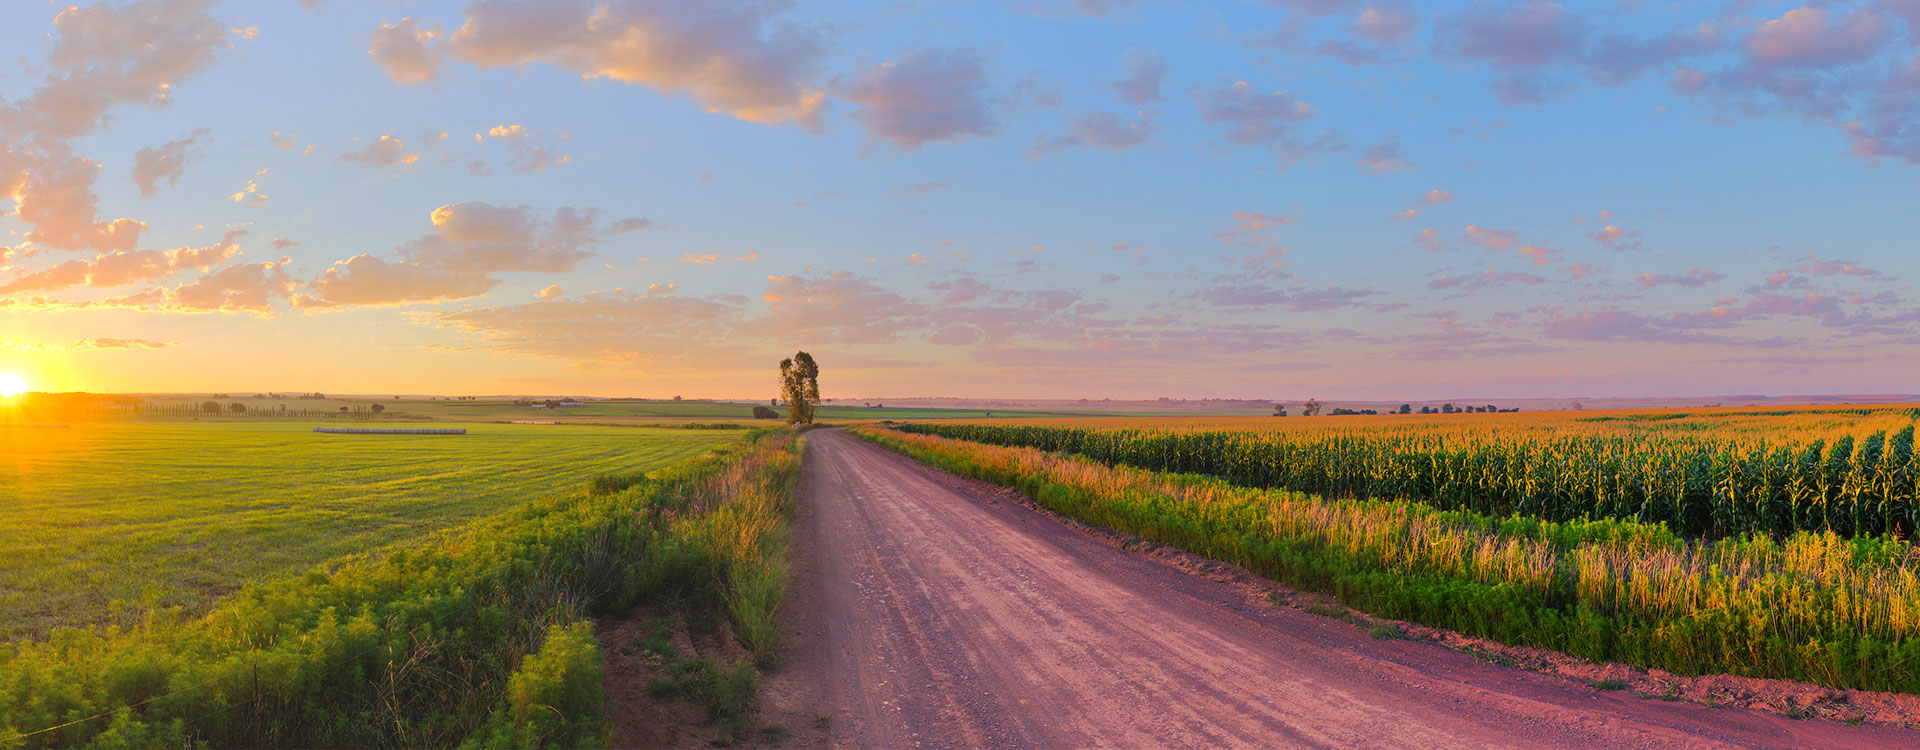 slider-corn-field